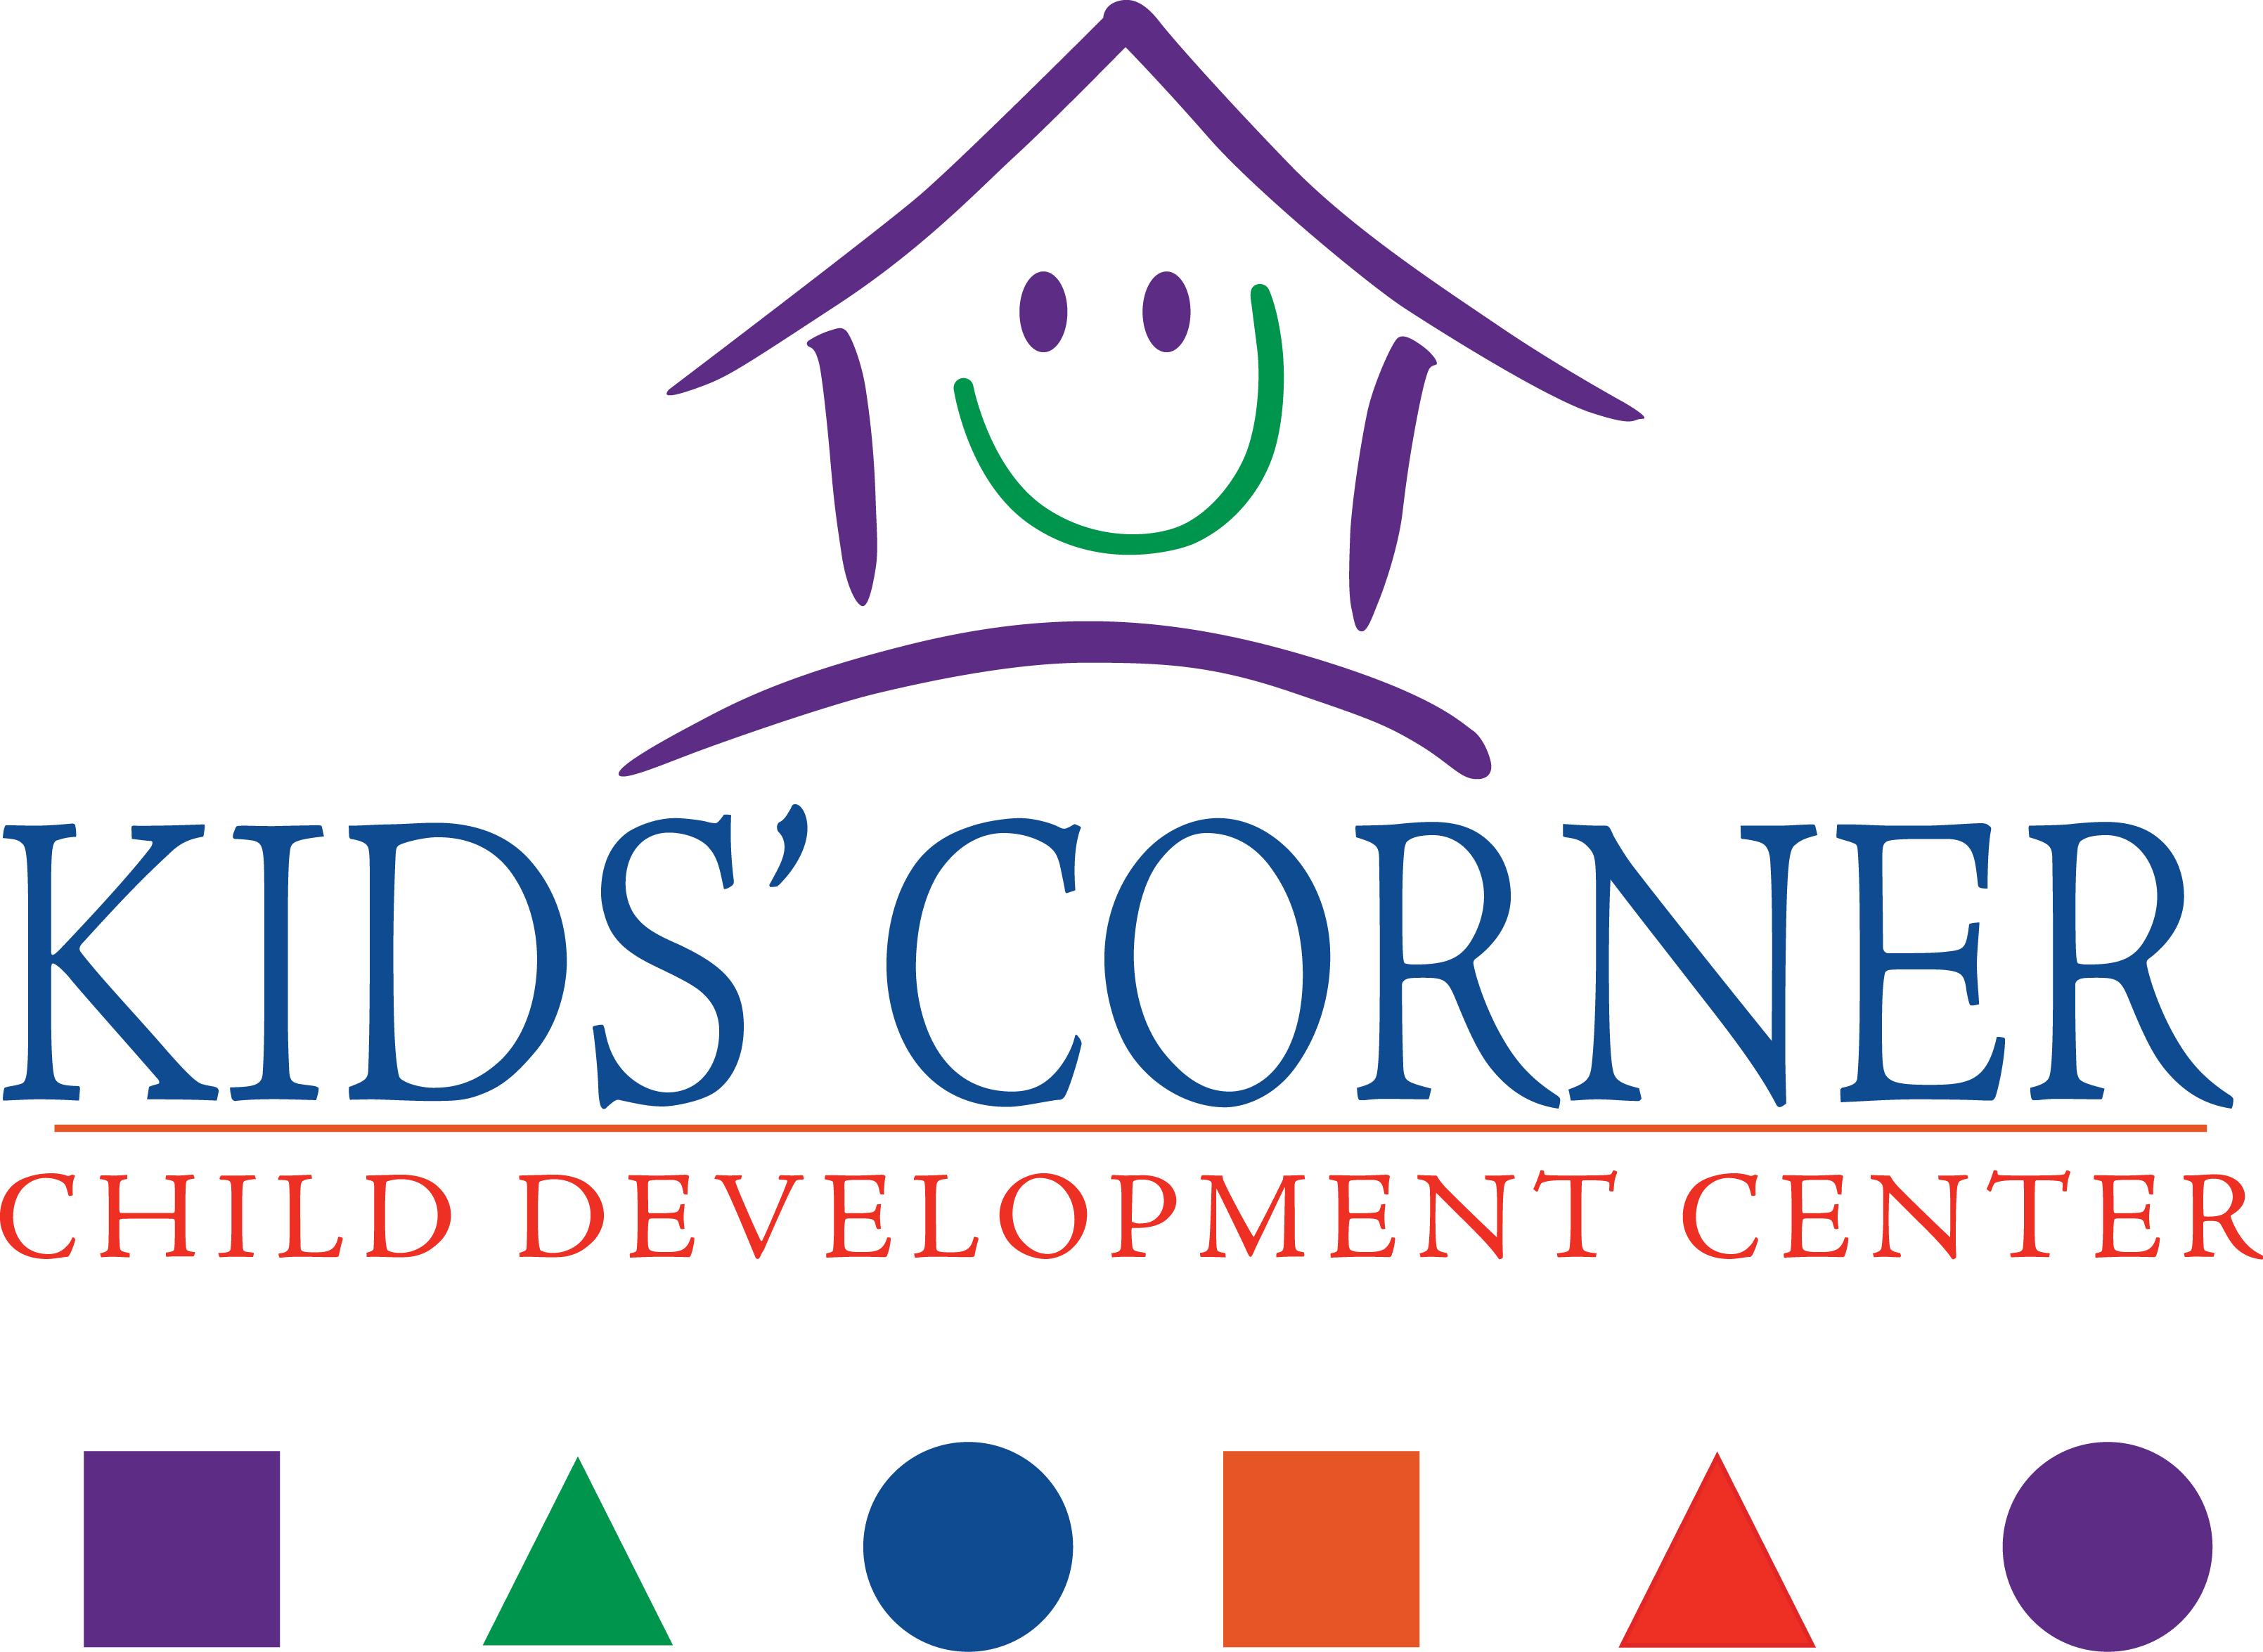 Kids Corner Child Development Center